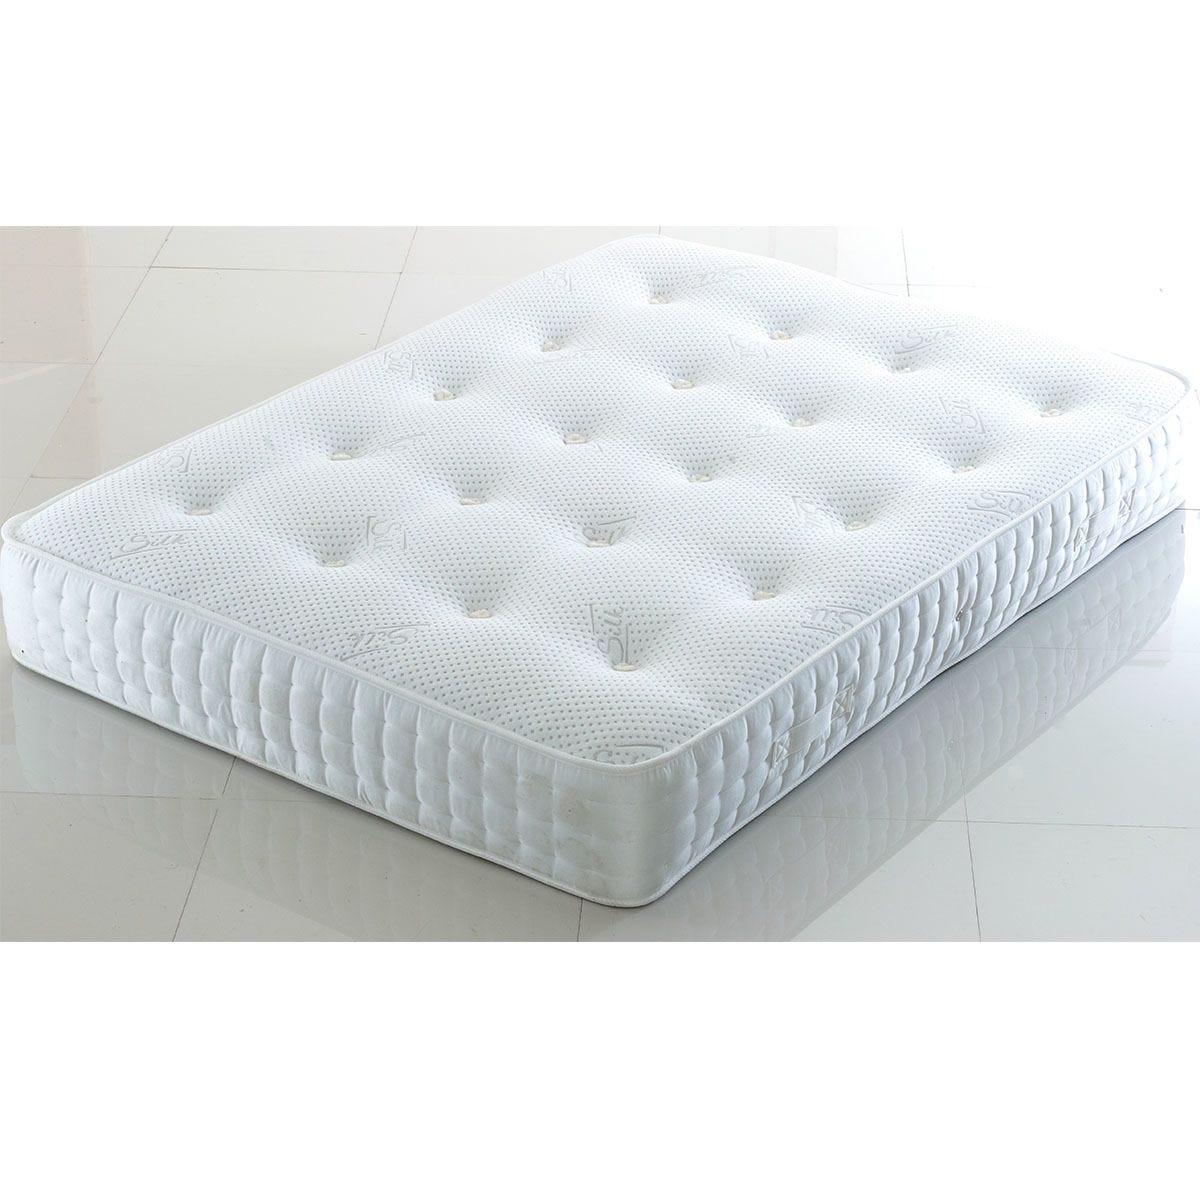 Comfy Deluxe 1000 Pocket Silk Mattress - White